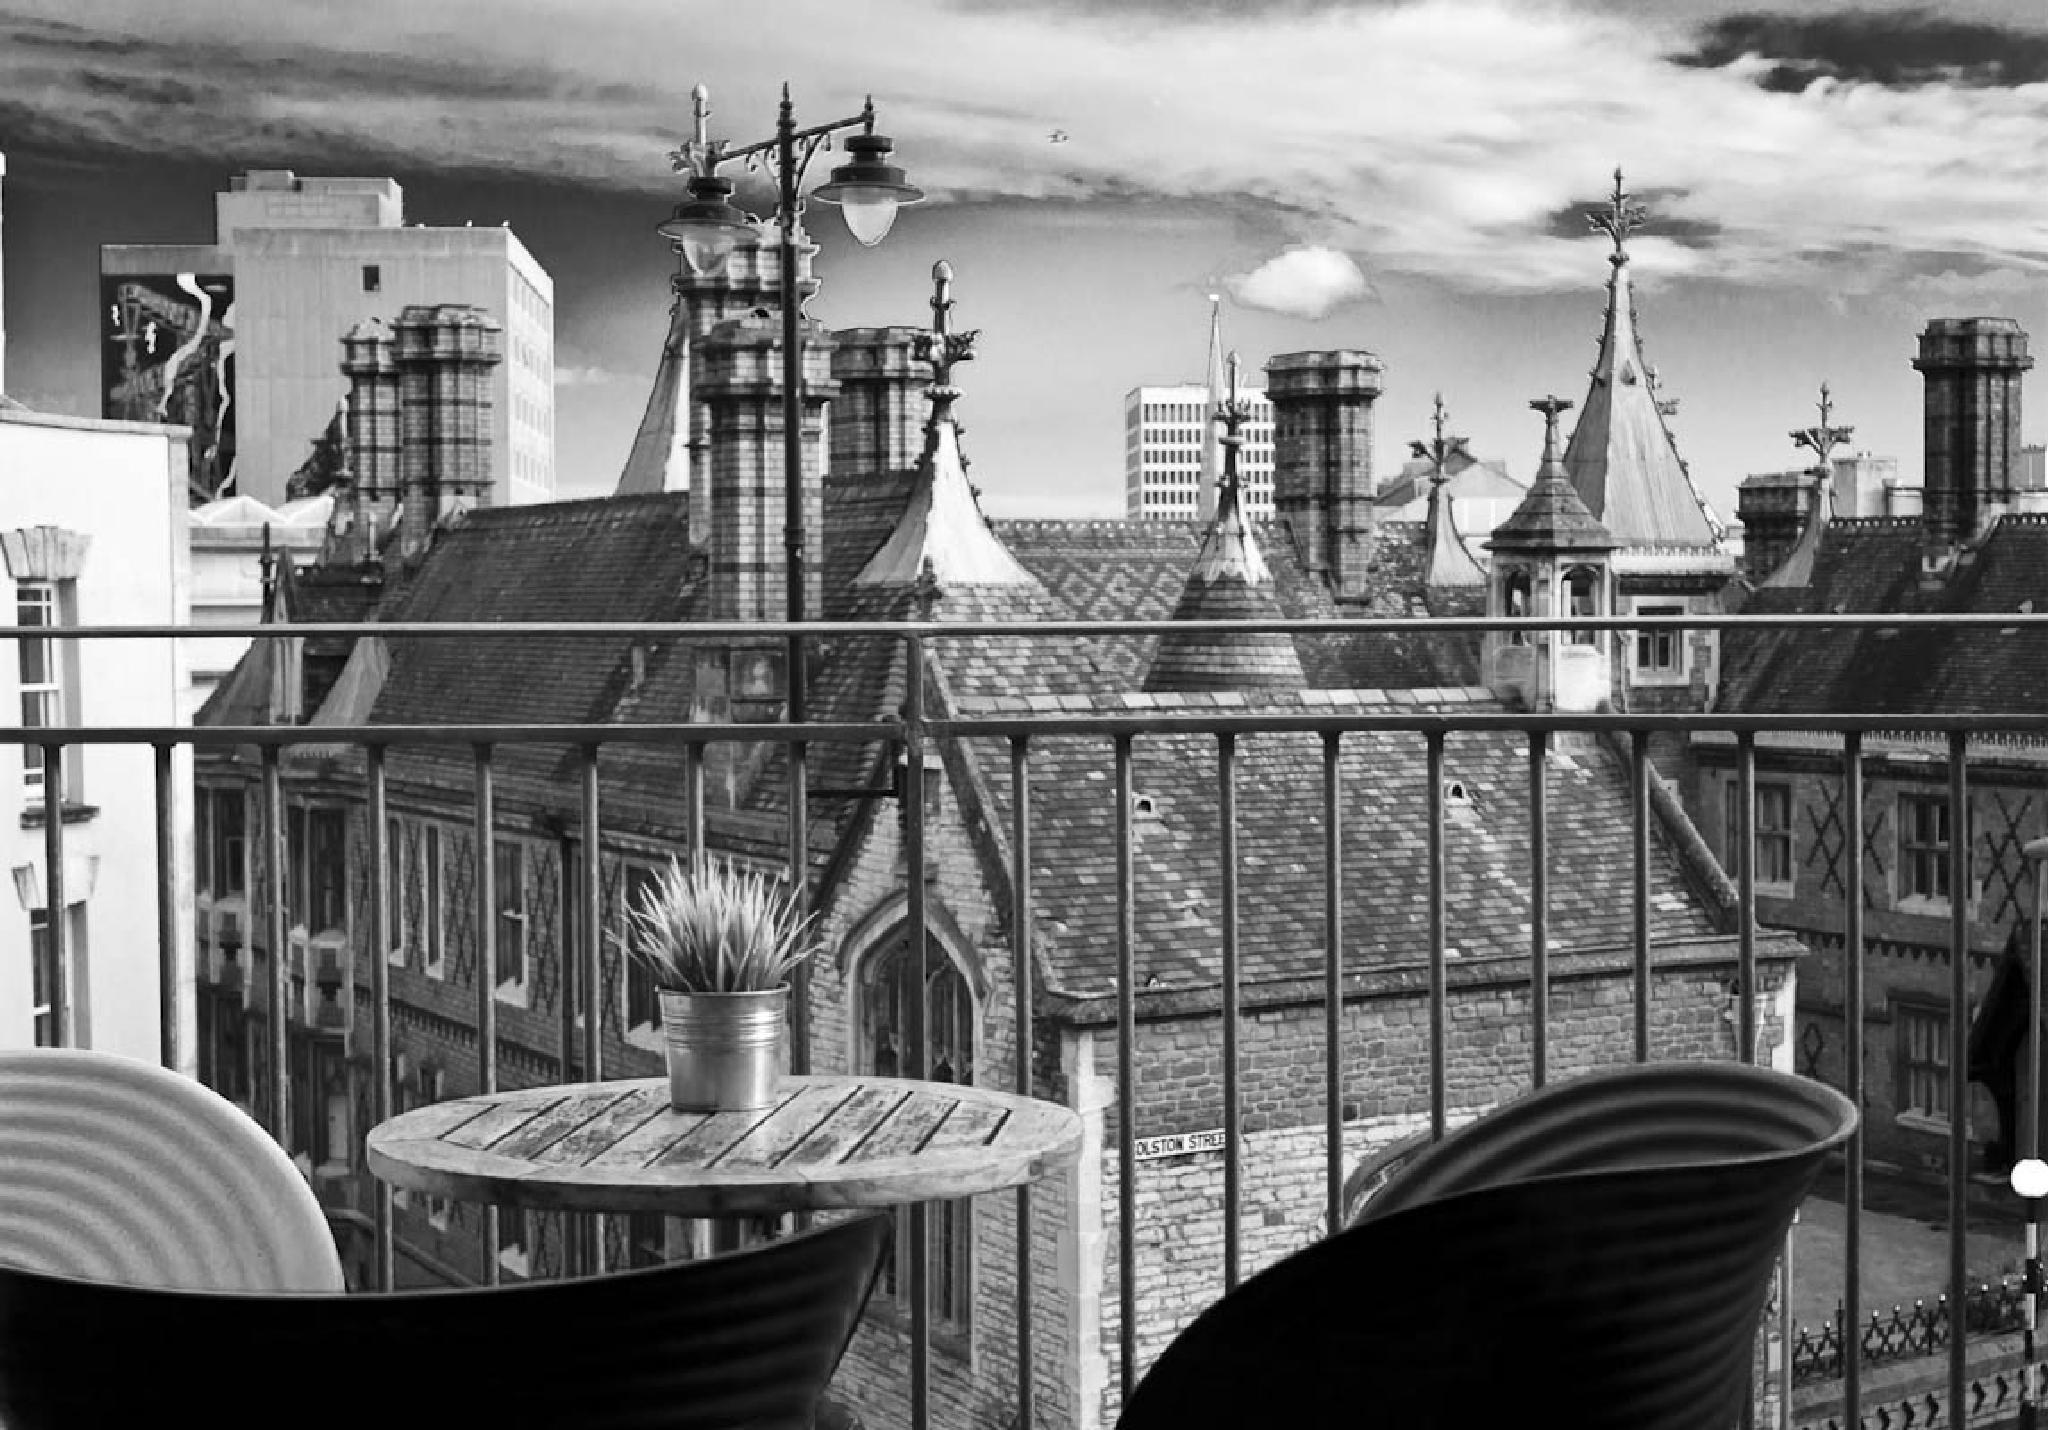 Bristol Rooftops by steve.wanstall